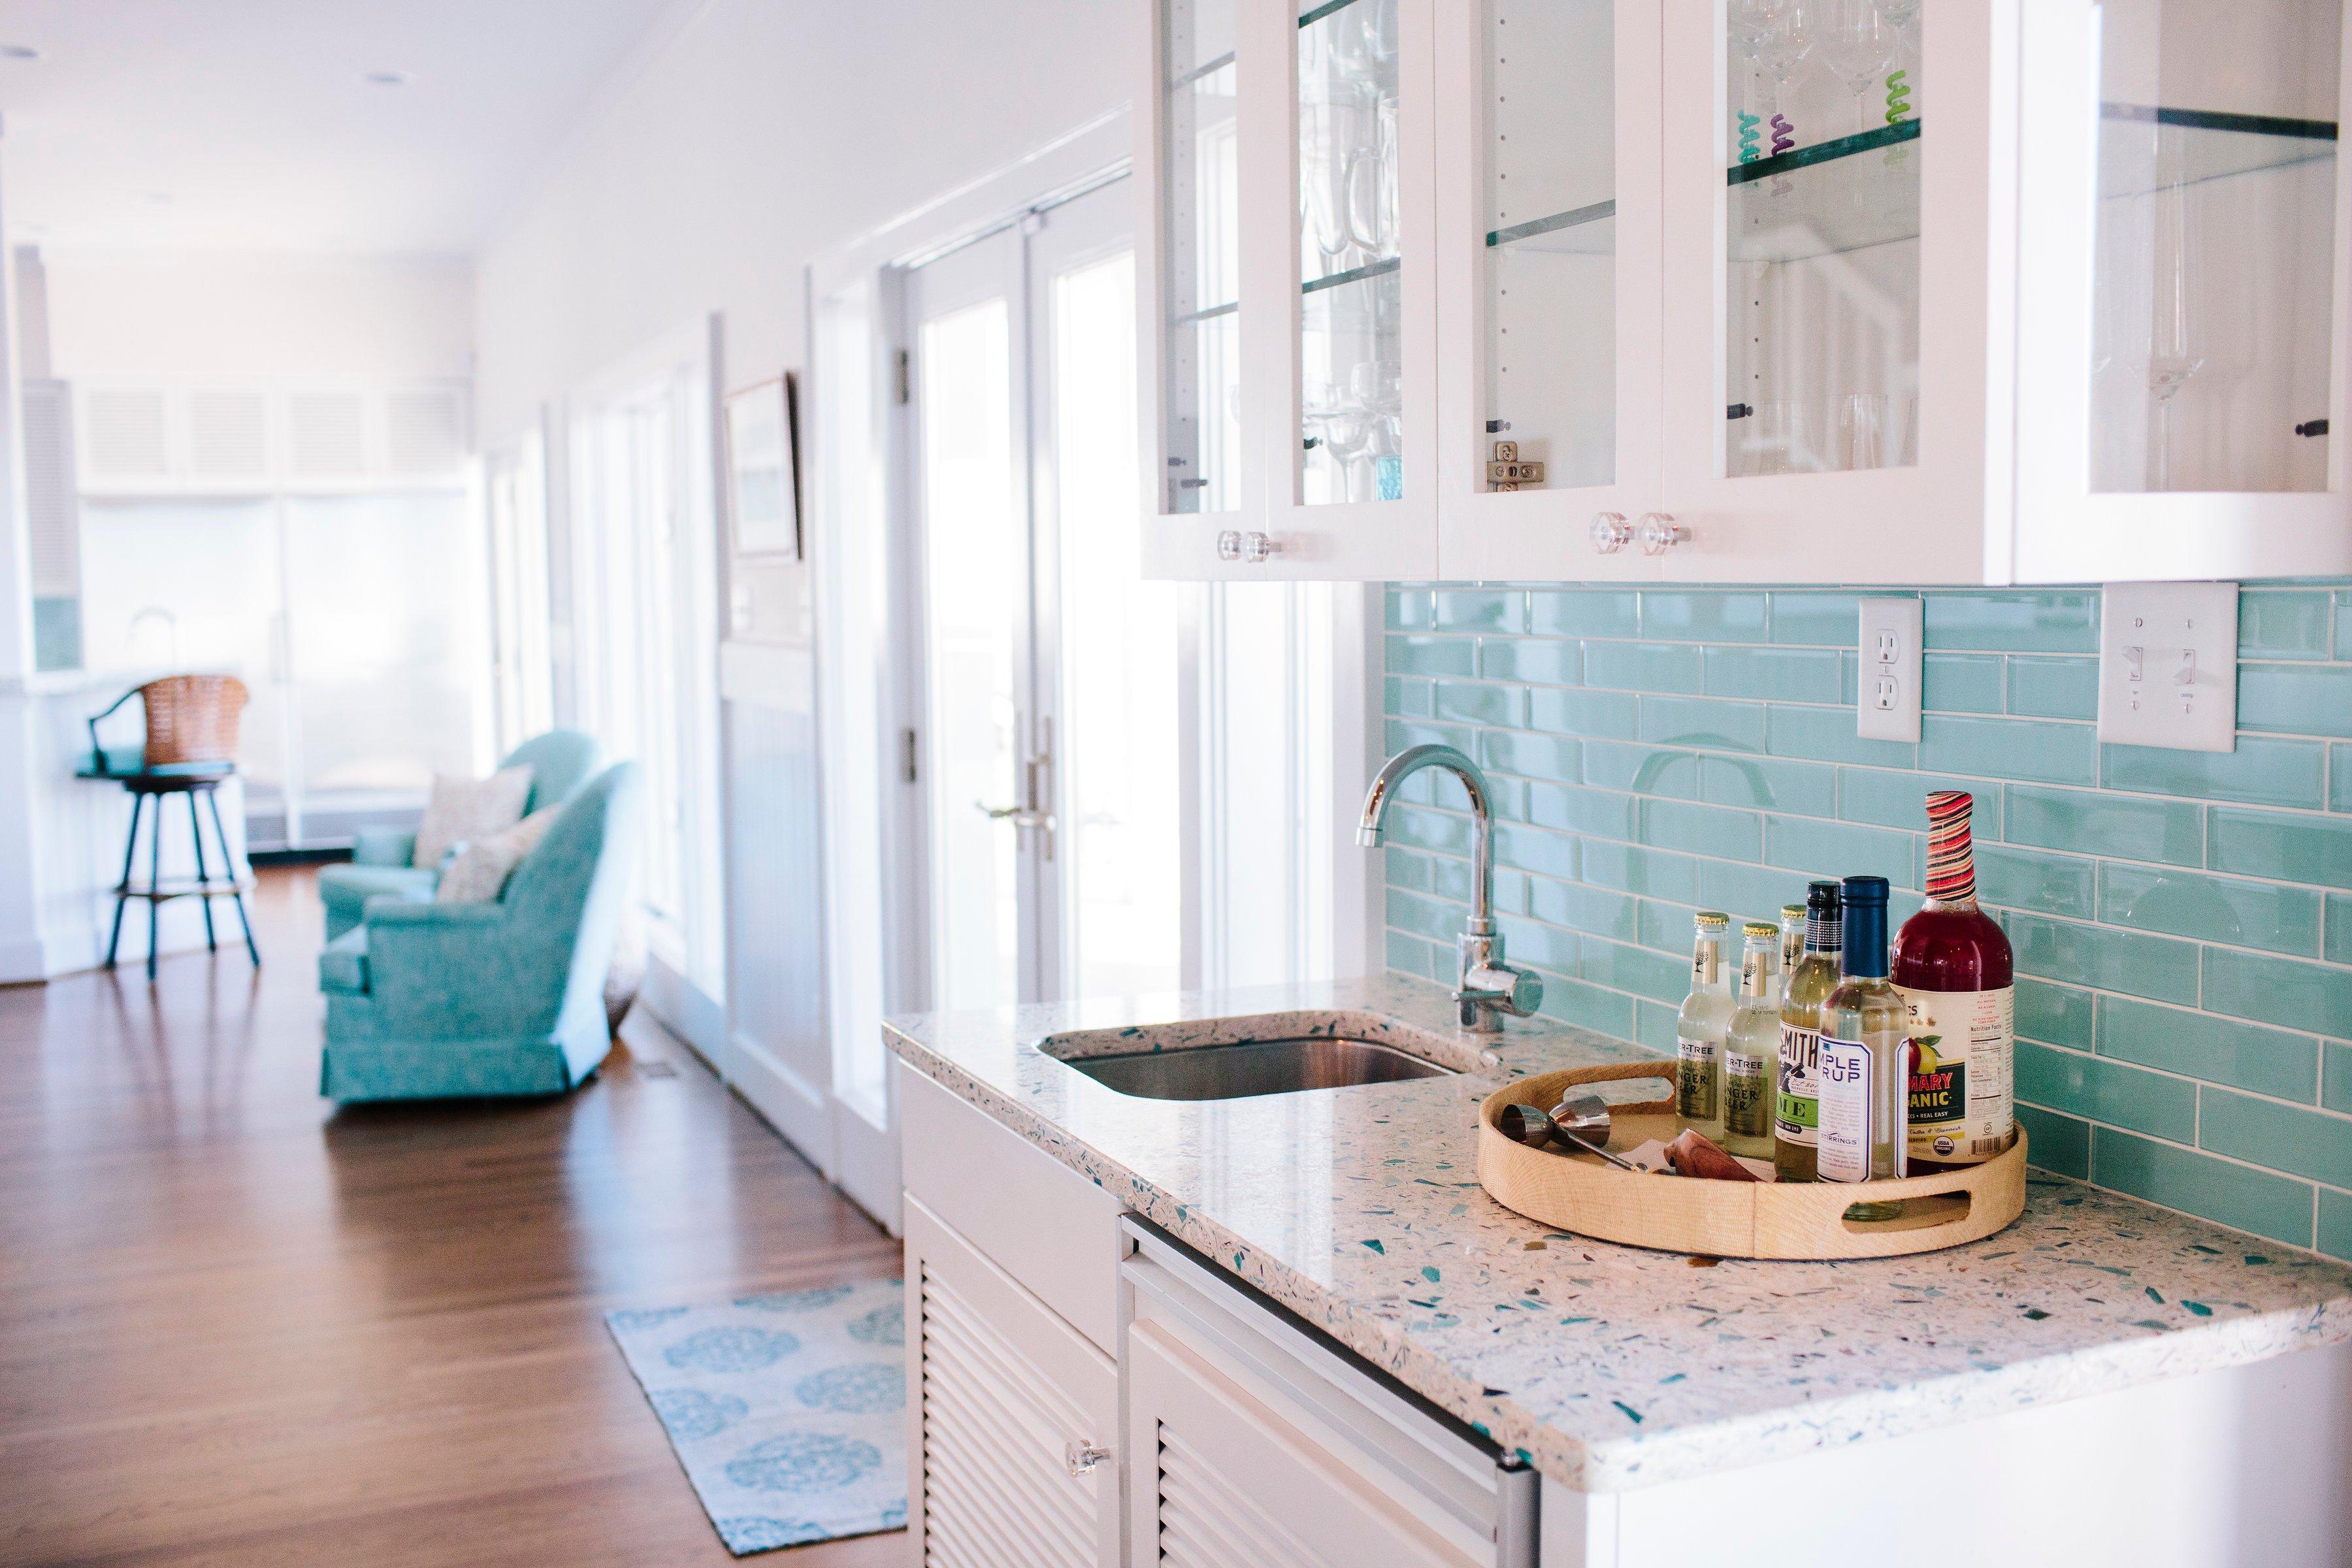 Vetrazzo-Recycled-Glass-Bretagne-Blue-Kitchen-Countertops-Gathered-Design-2